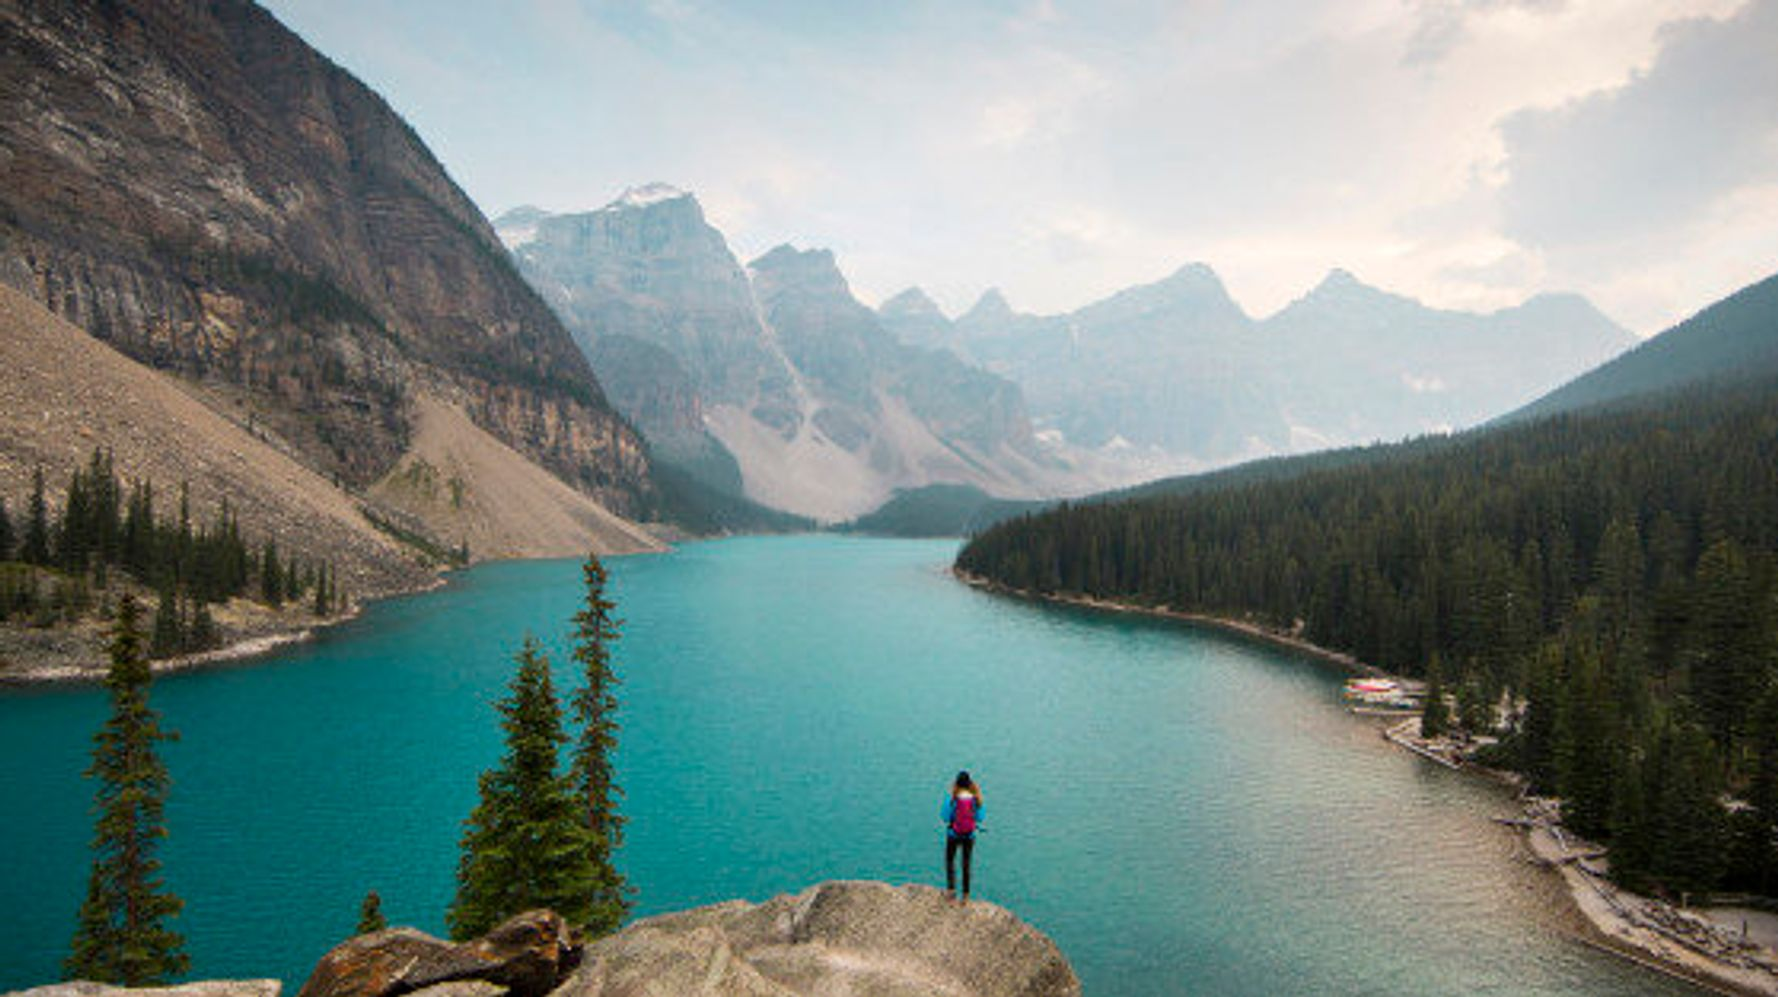 abraham, Lake, Banff, Alberta, Canada, Sky, Mountain, Lake